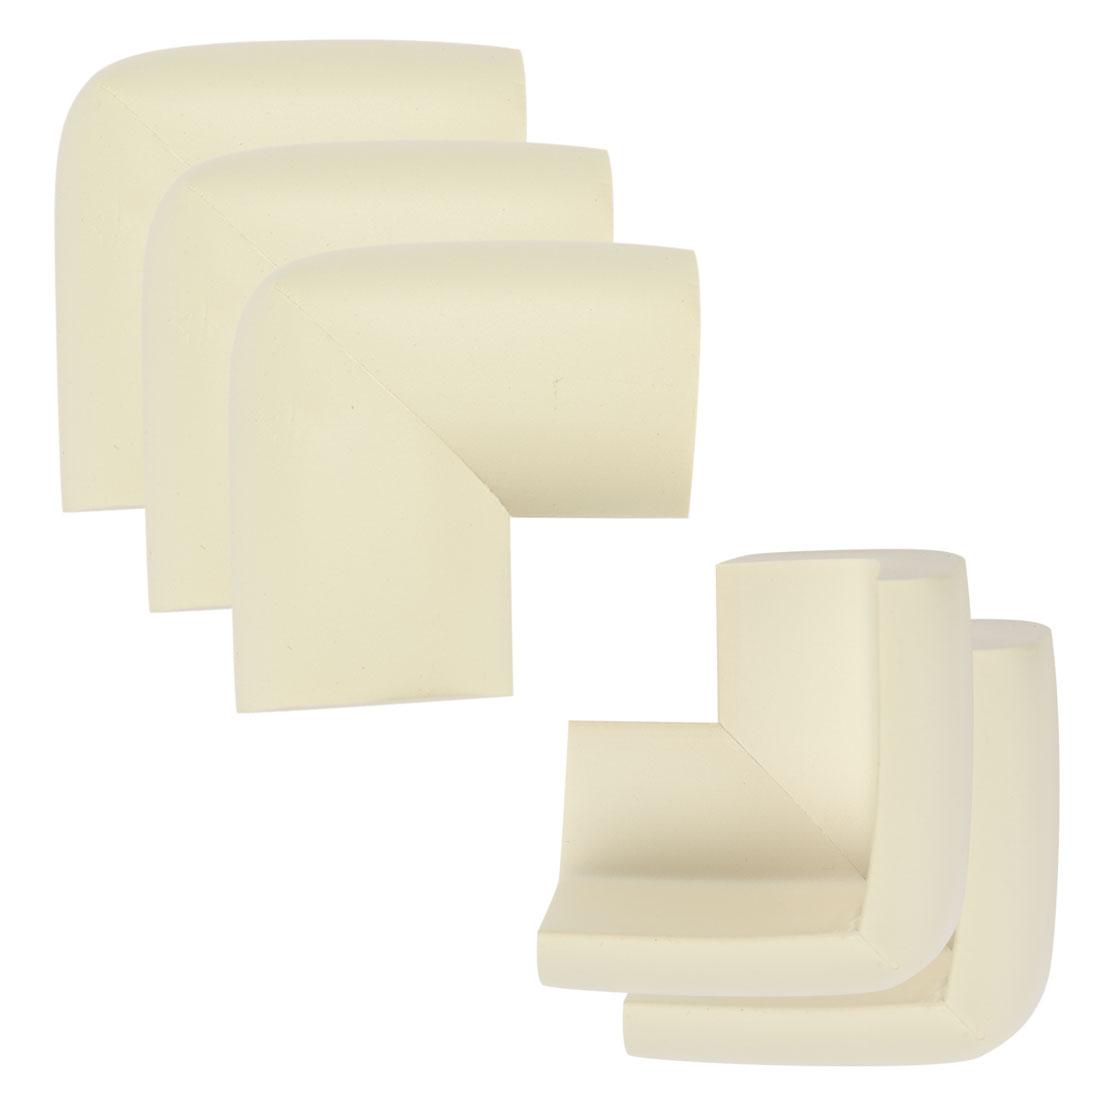 Desk Table Edge Foam Corner Cushion Guards Soft Bumper Protector 5pcs Beige